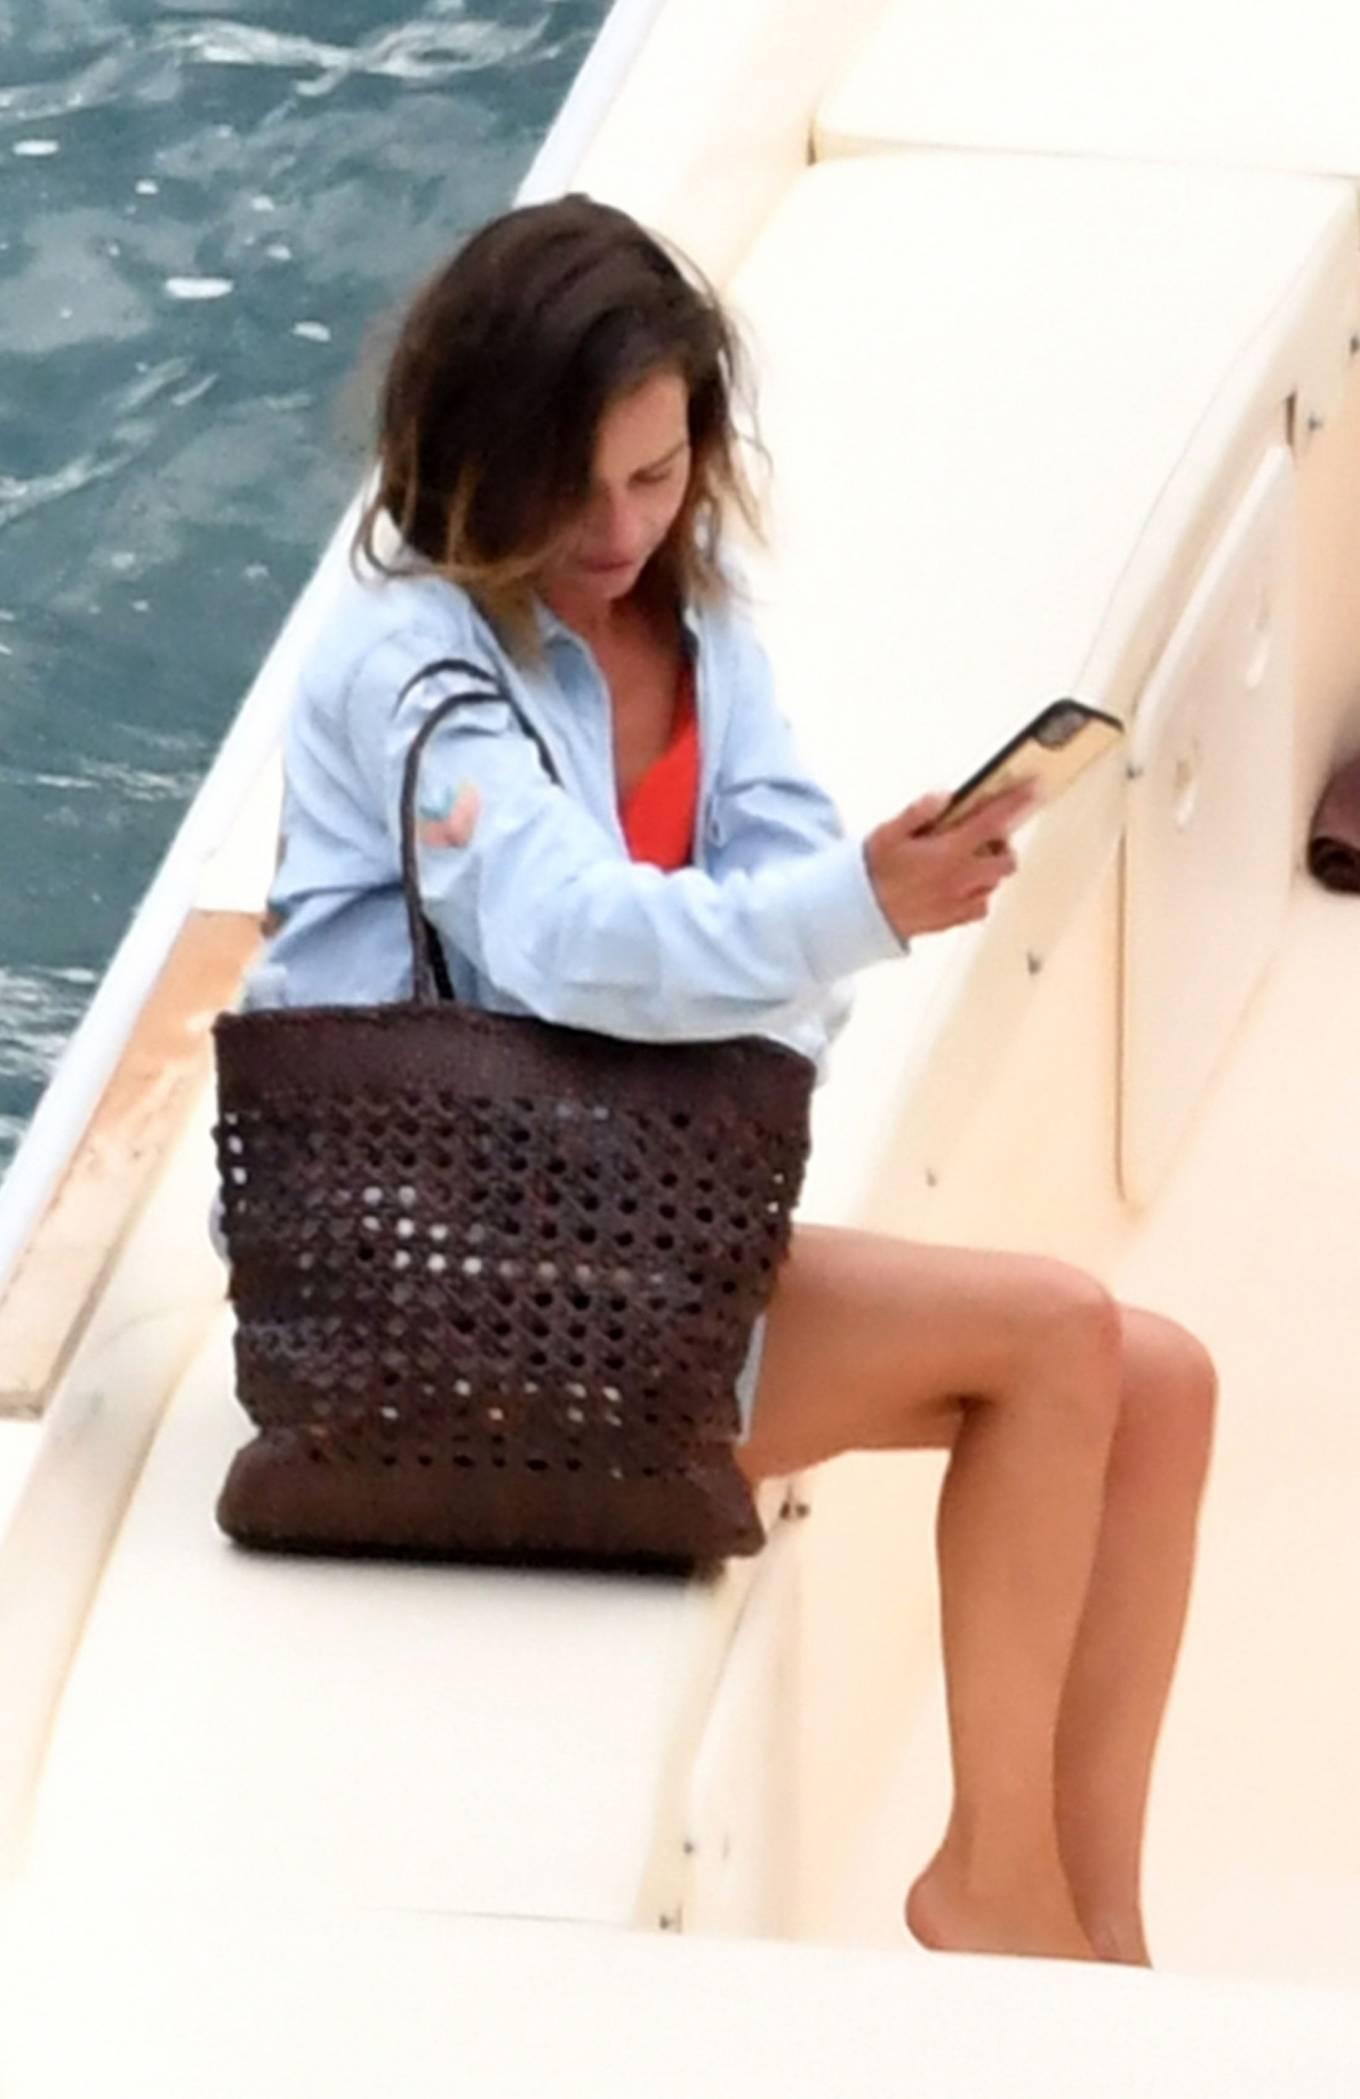 Emilia Clarke seen on her holiday break out in Positano